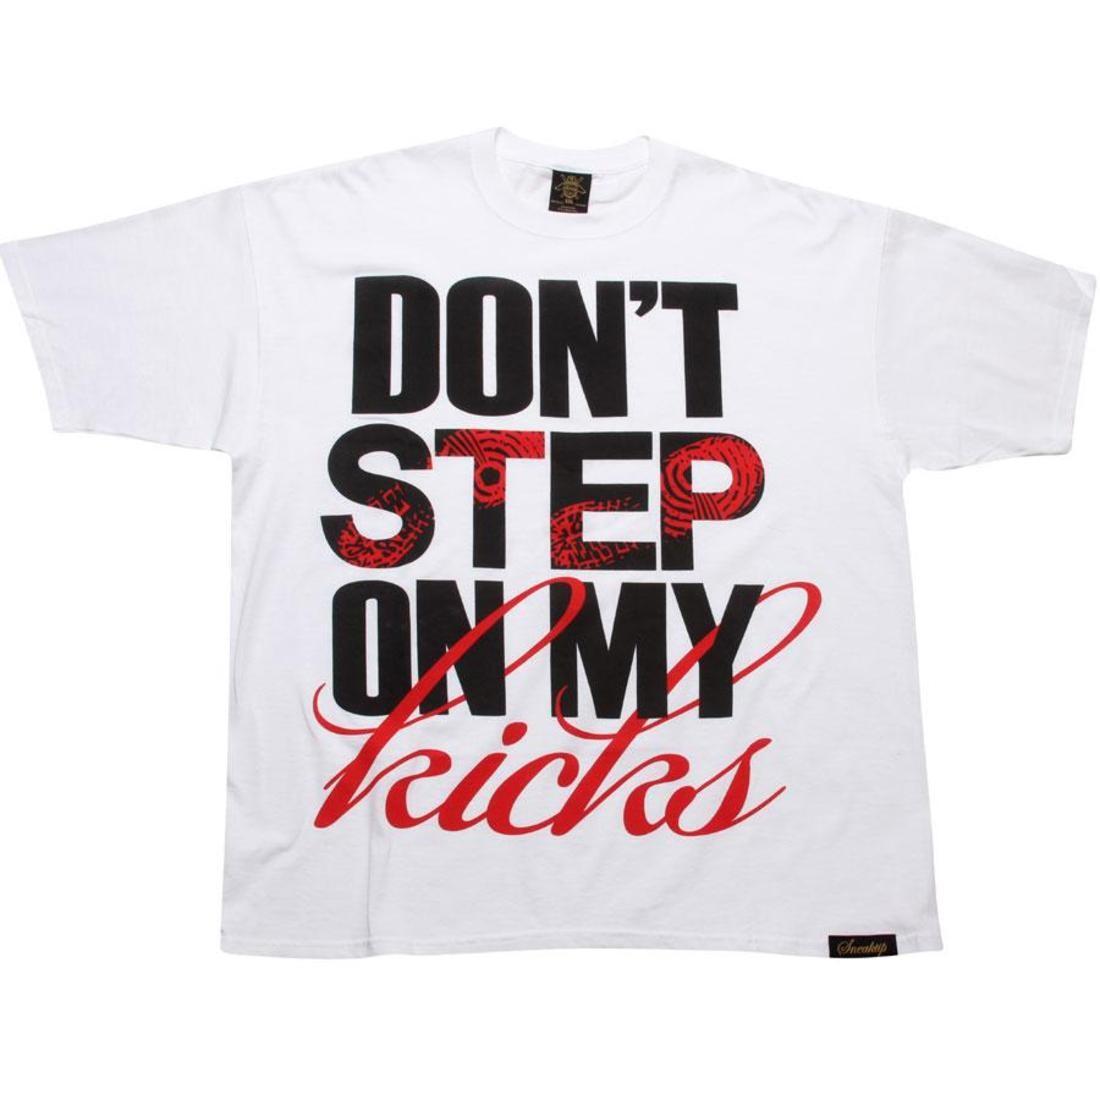 SNEAKTIP スニークティップ Tシャツ 黒 ブラック 白 ホワイト 赤 レッド 【 BLACK WHITE RED SNEAKTIP DONT STEP ON MY KICKS TEE 】 メンズファッション トップス Tシャツ カットソー